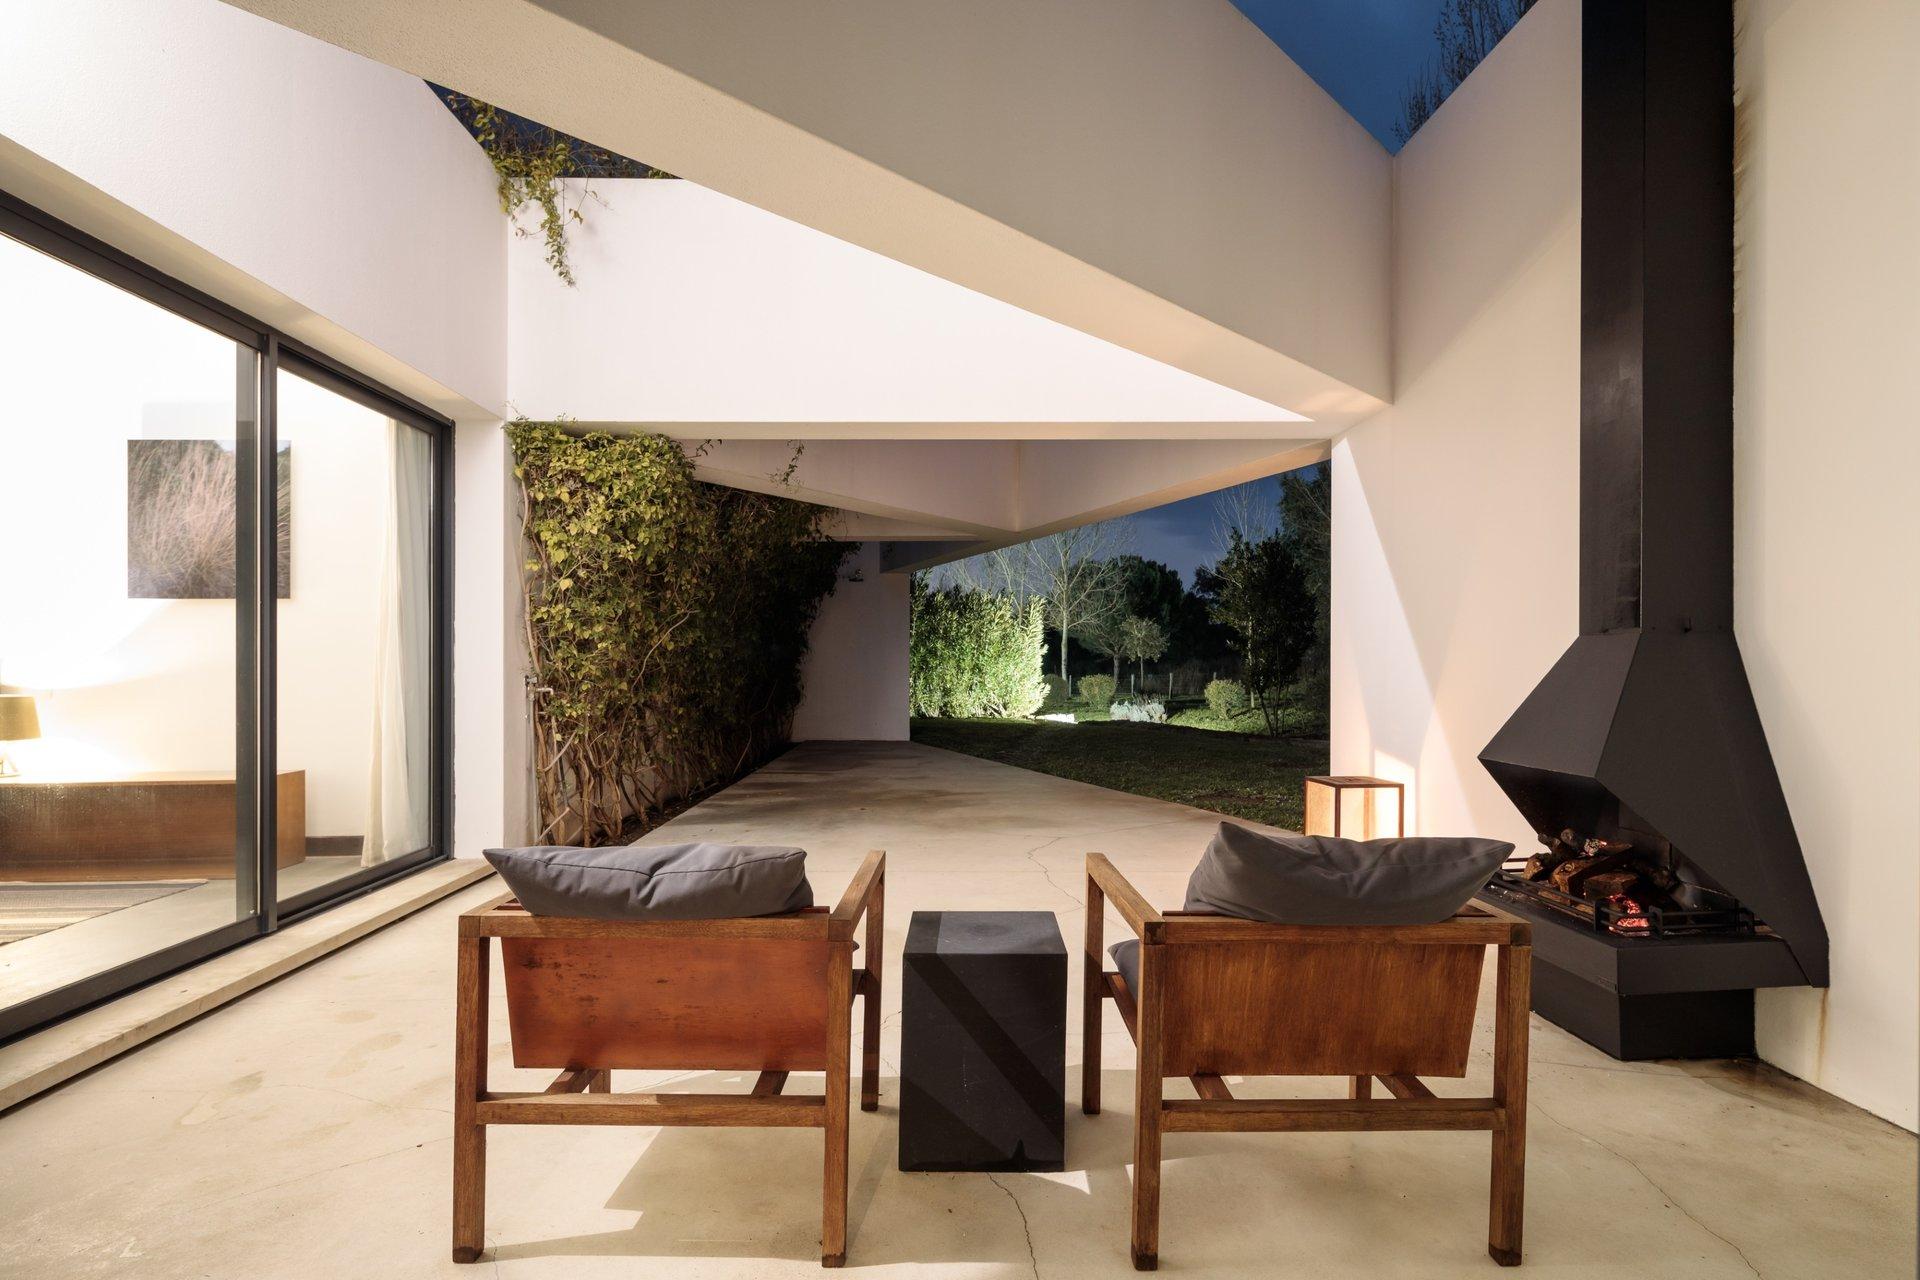 3 Bedroom Villa Montemor-o-Novo, Alentejo Ref: ASV192K